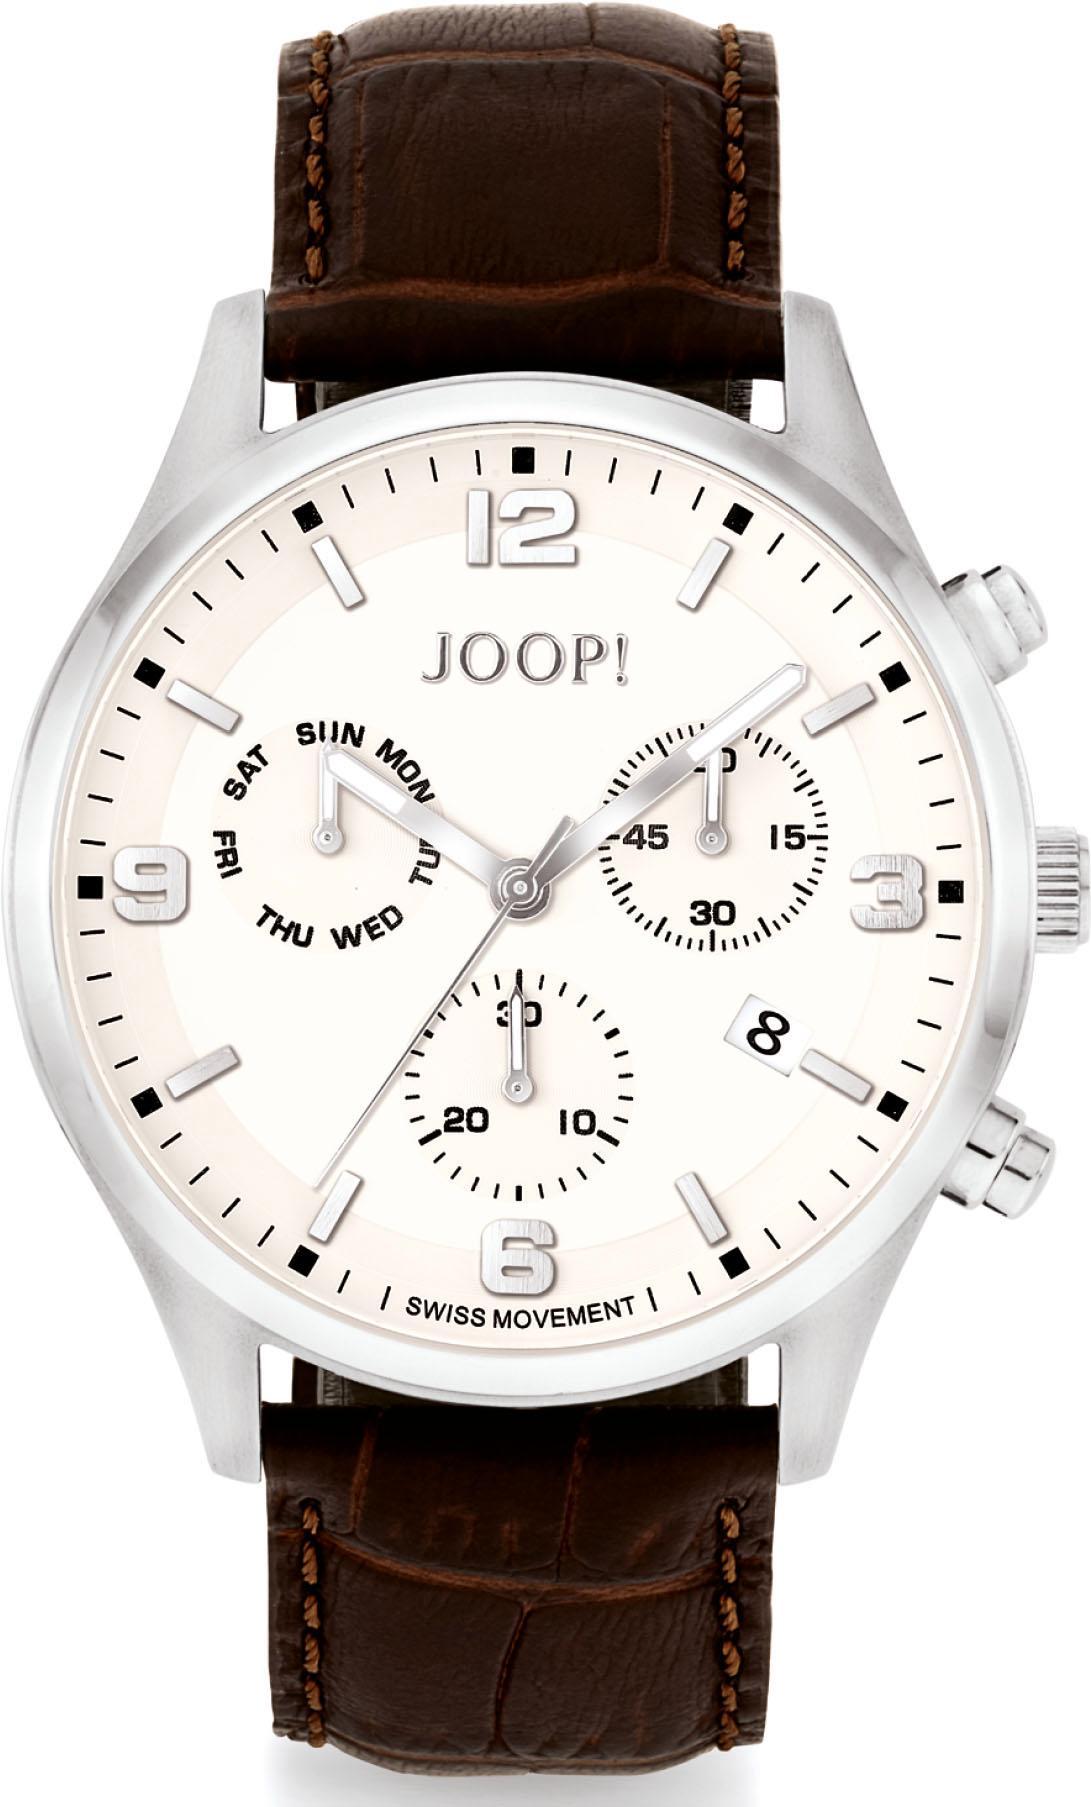 Joop! Chronograph 2022866   Uhren   Braun   Joop!